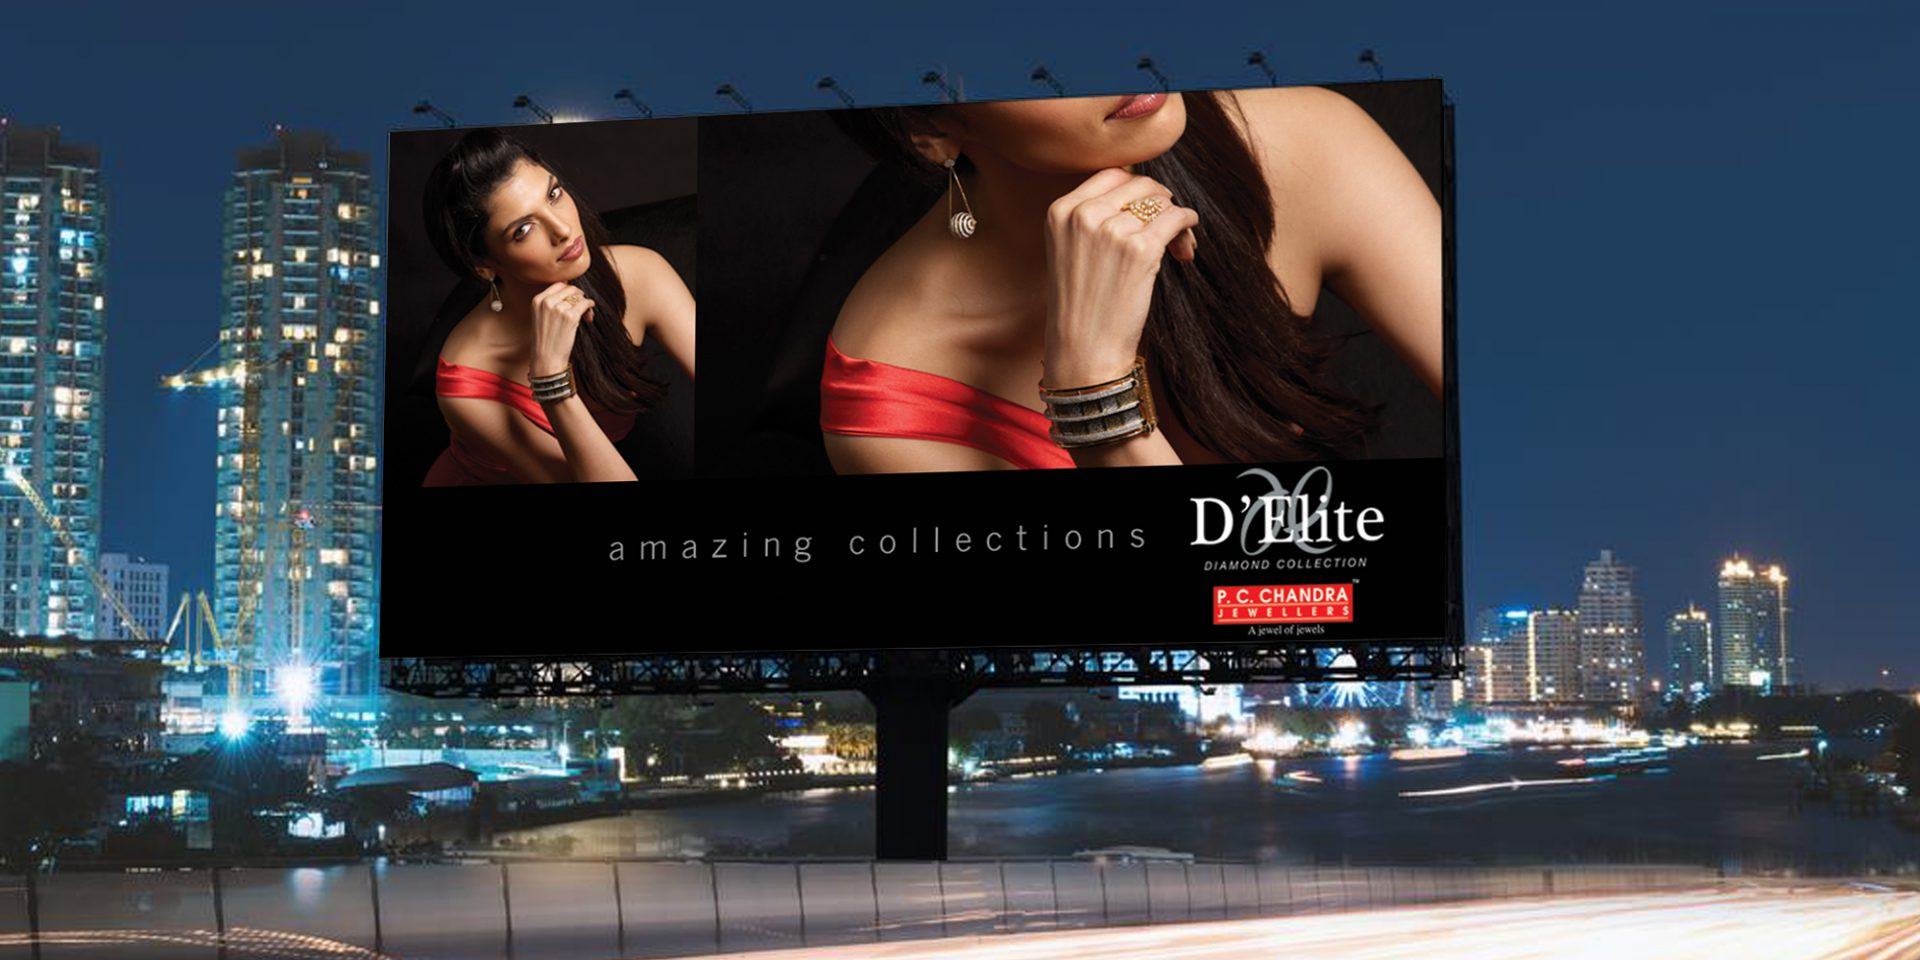 pcc jewellery ad hoarding - P.C. Chandra